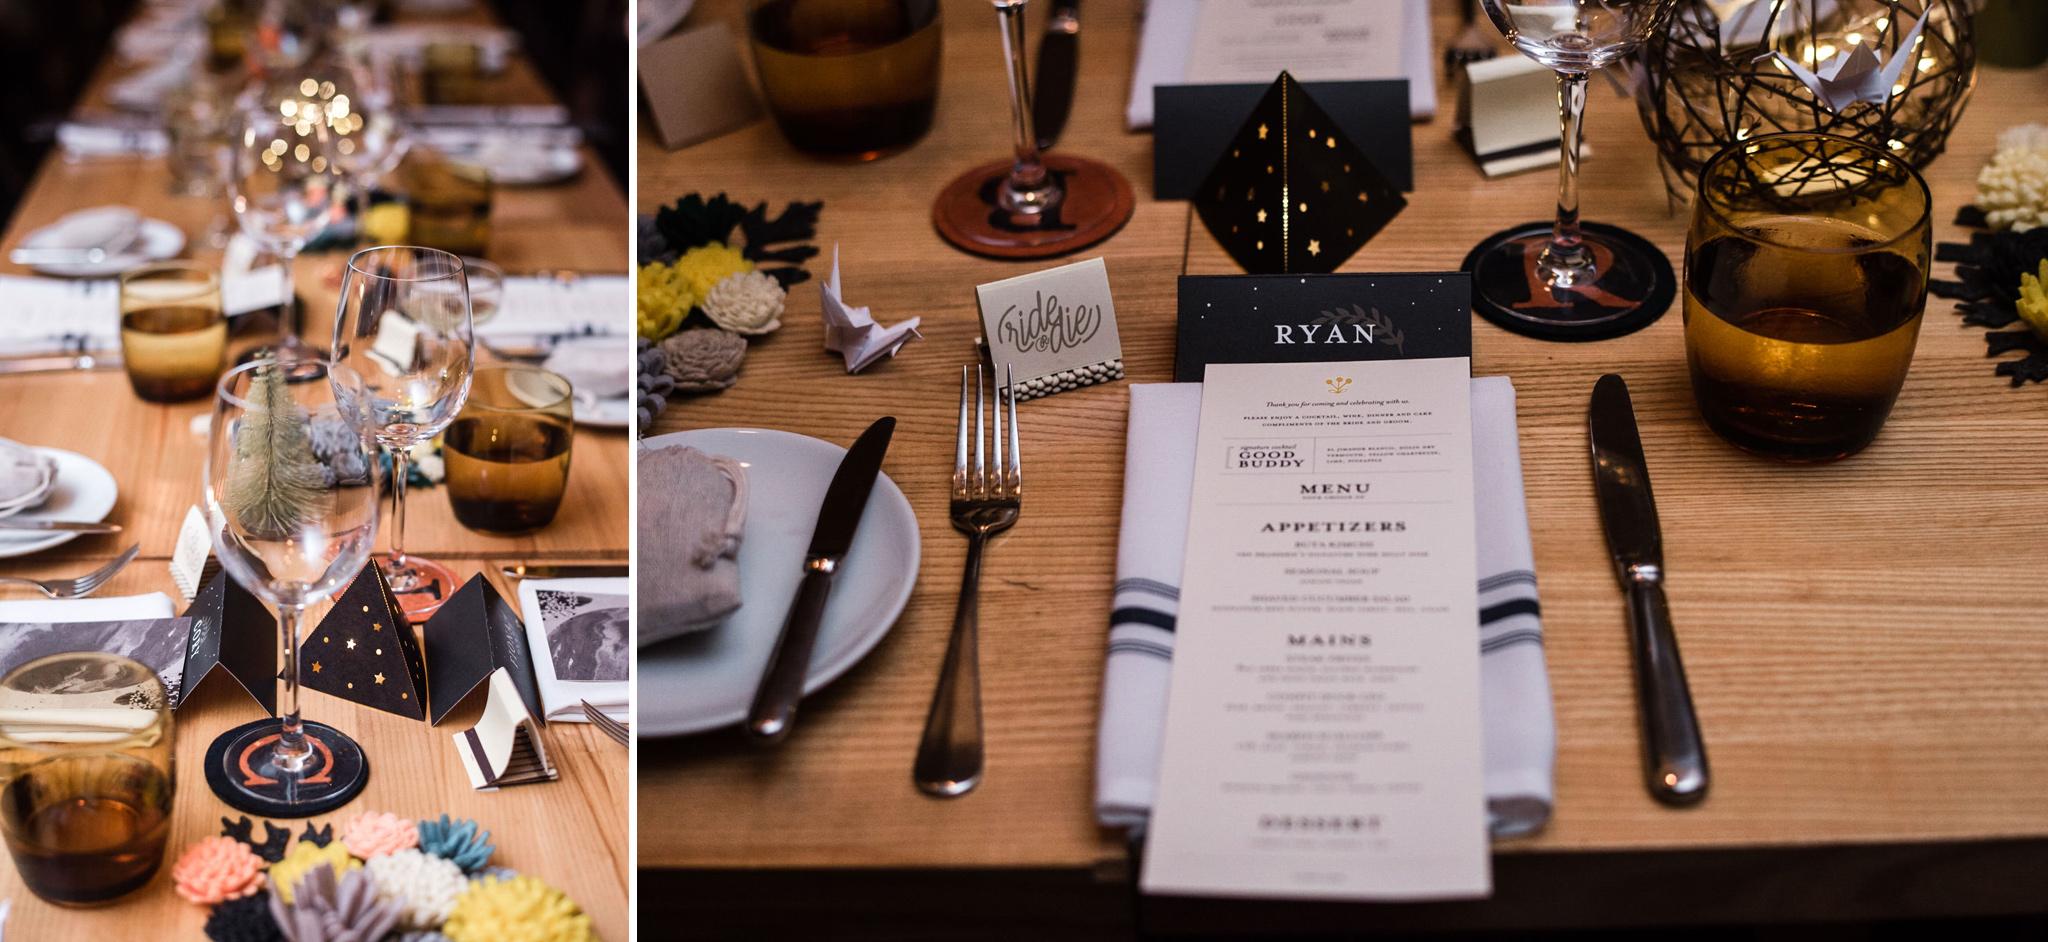 116-intimate-restaurant-wedding-toronto-wedding-photographer.jpg